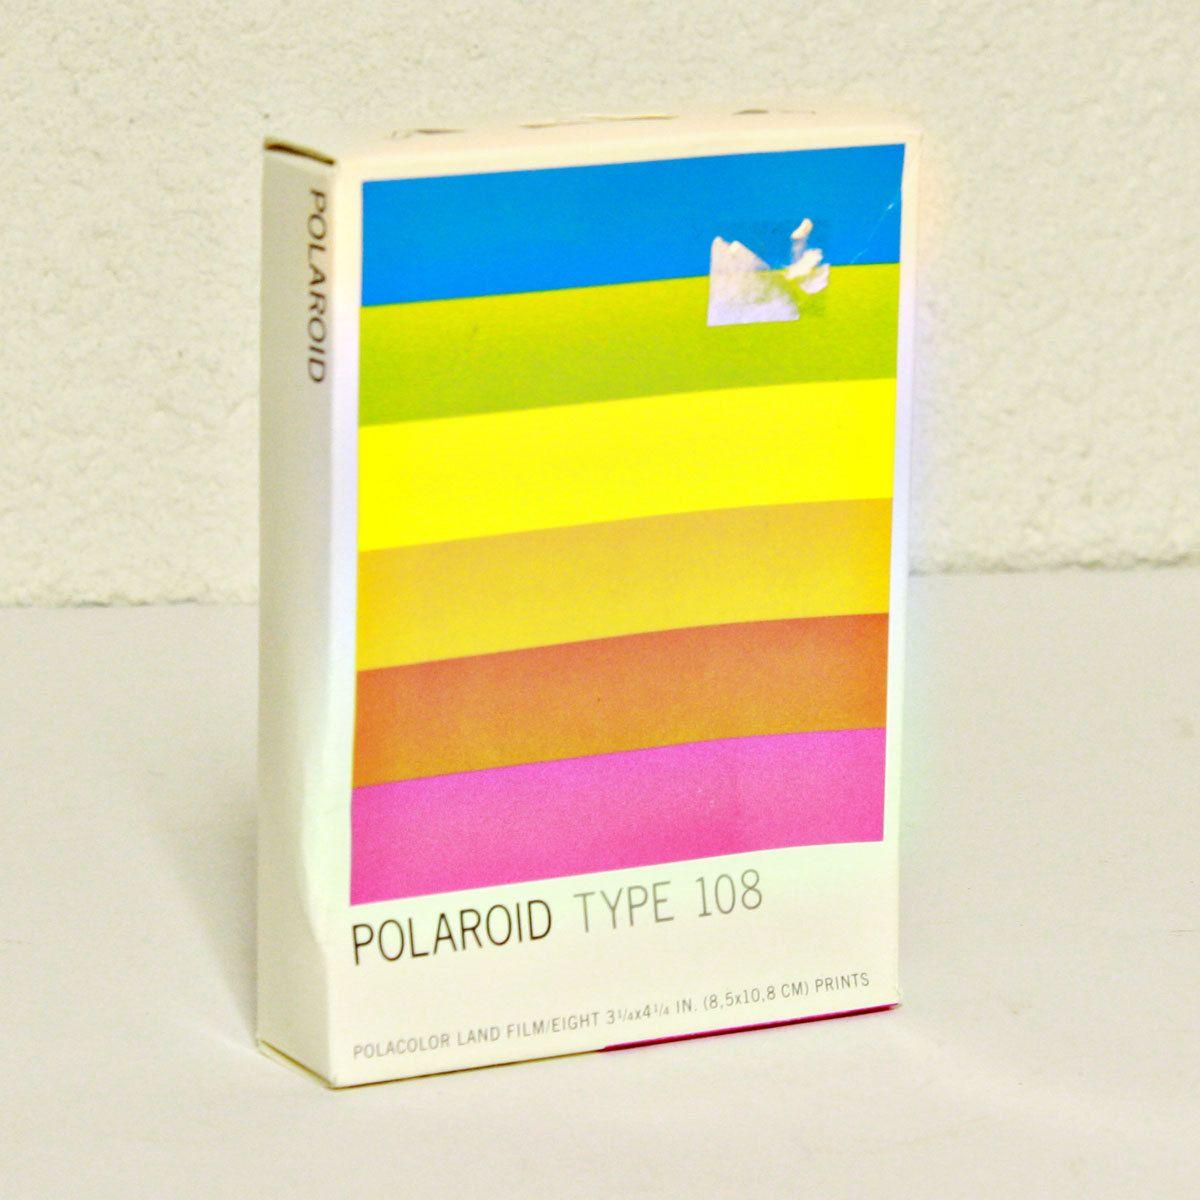 Vintage camera film - Polaroid - Type 108 - Land Camera film